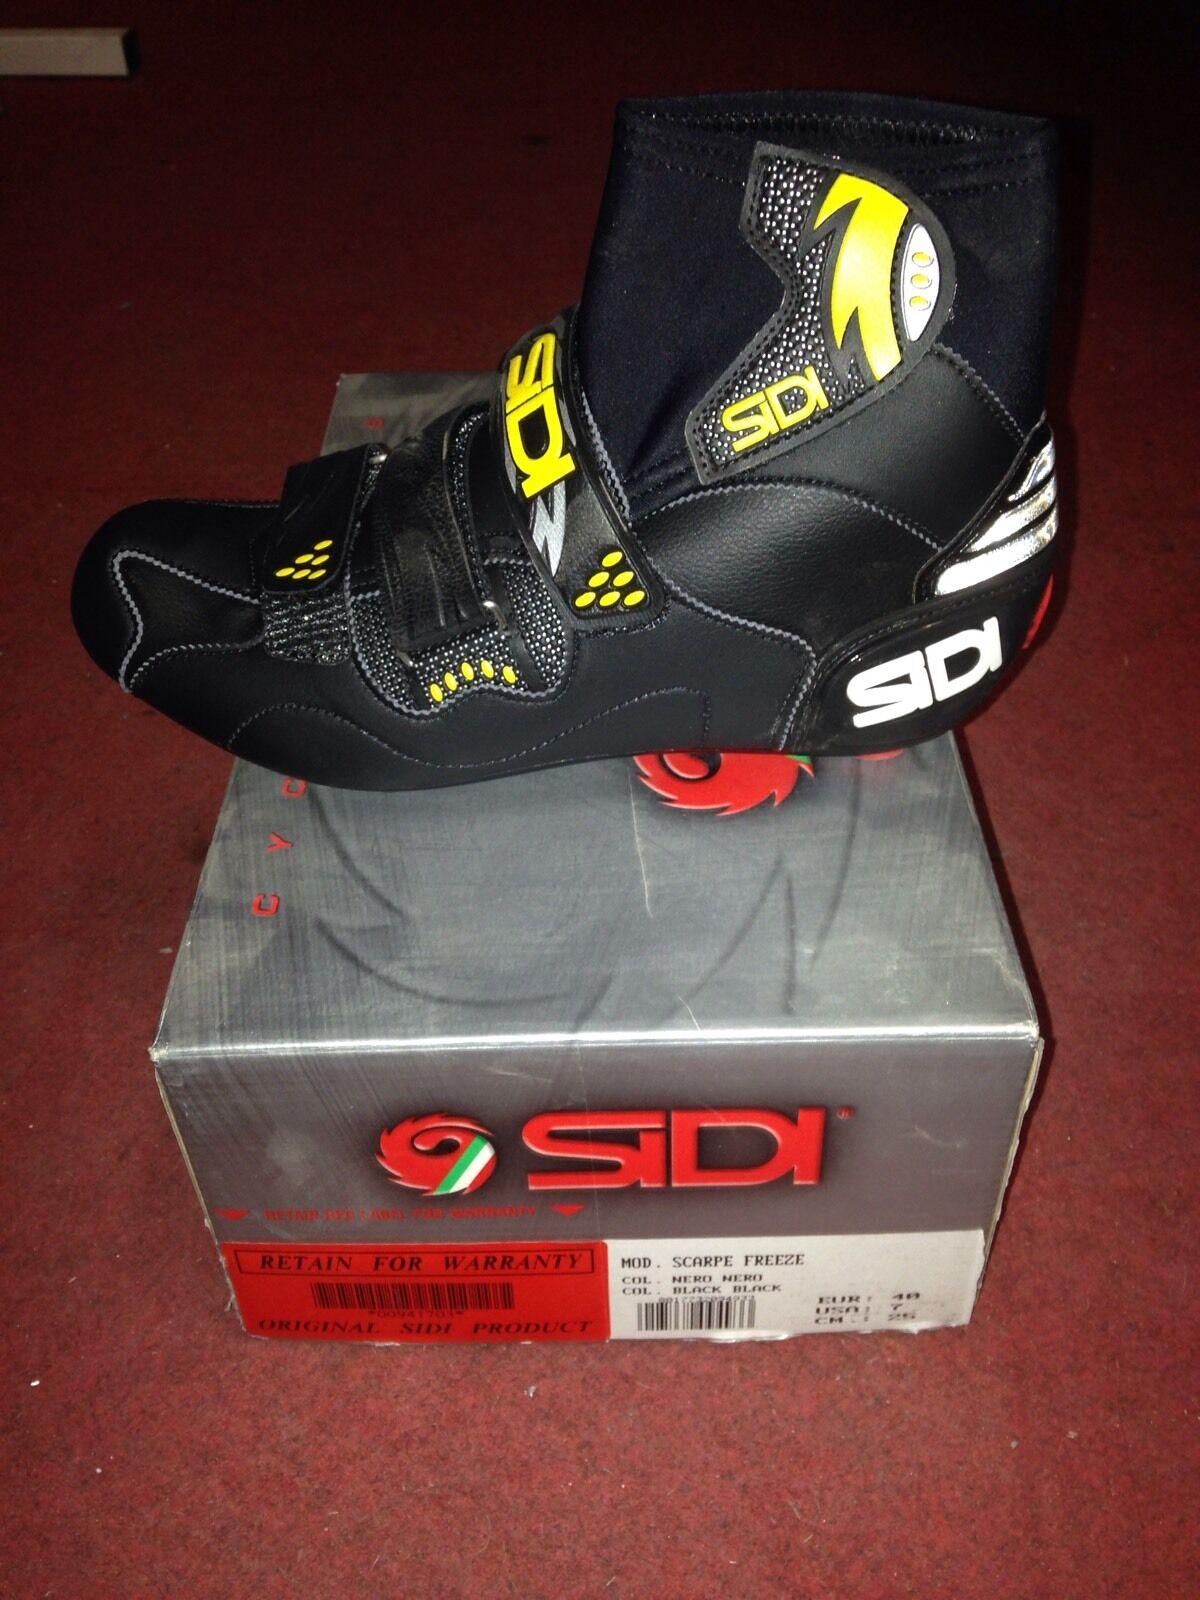 zapatos Bici corsa Sidi Freeze Invernali road Bike zapatos winter 36 38 40